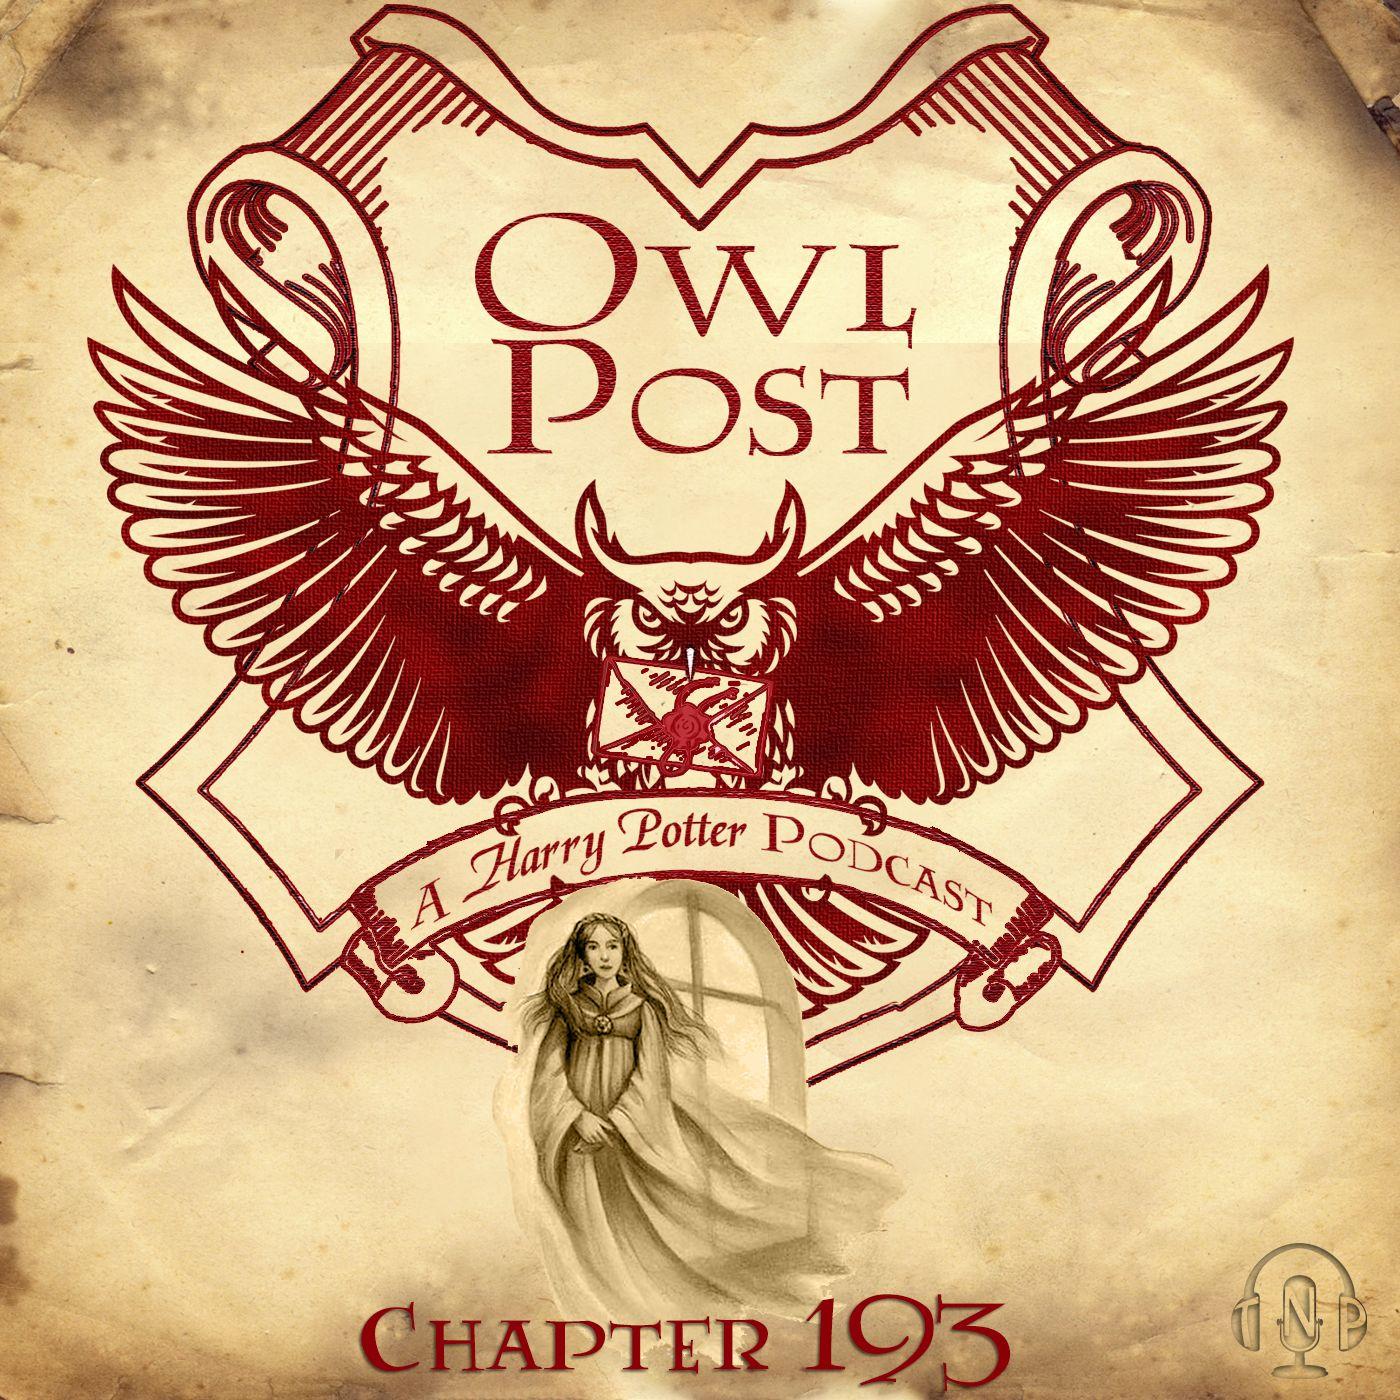 Chapter 193: The Battle of Hogwarts